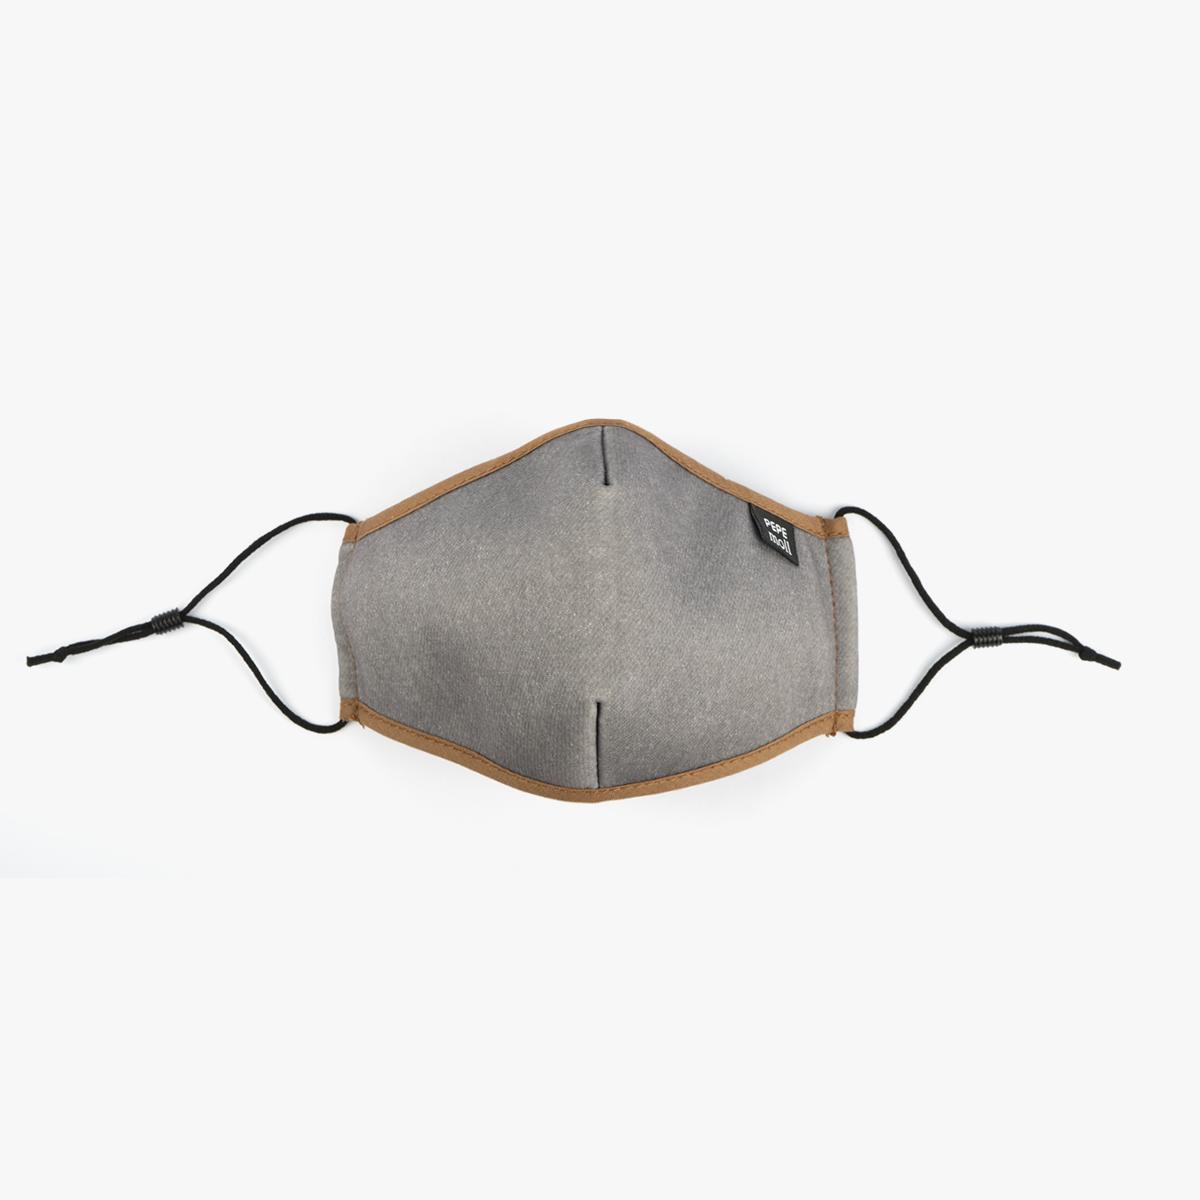 Mascarillas tejano gris para adultos unisex